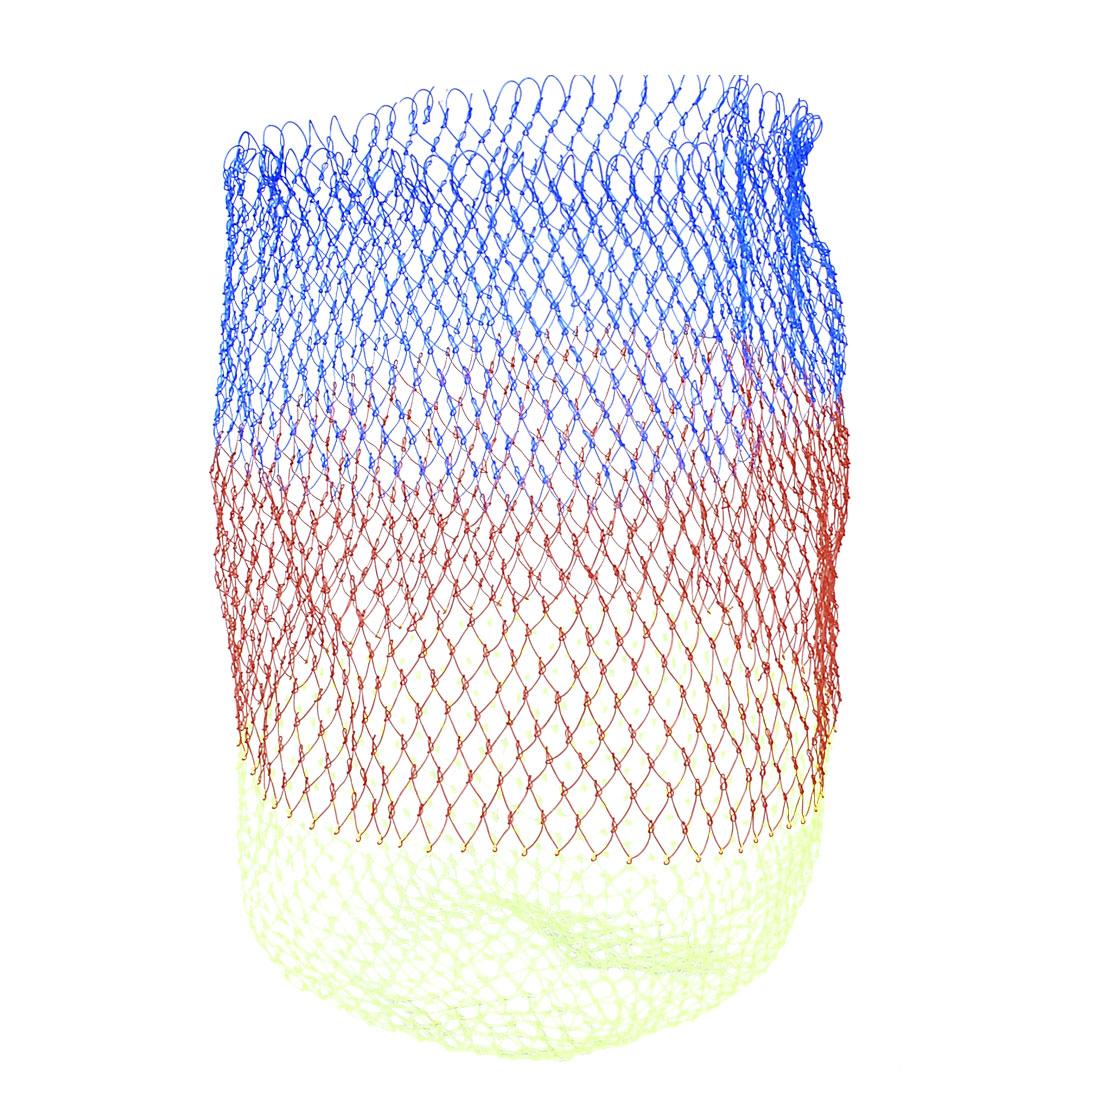 Red Blue Yellowgreen Nylon 1 x 1cm Rhombus Hole Fishing Landing Net